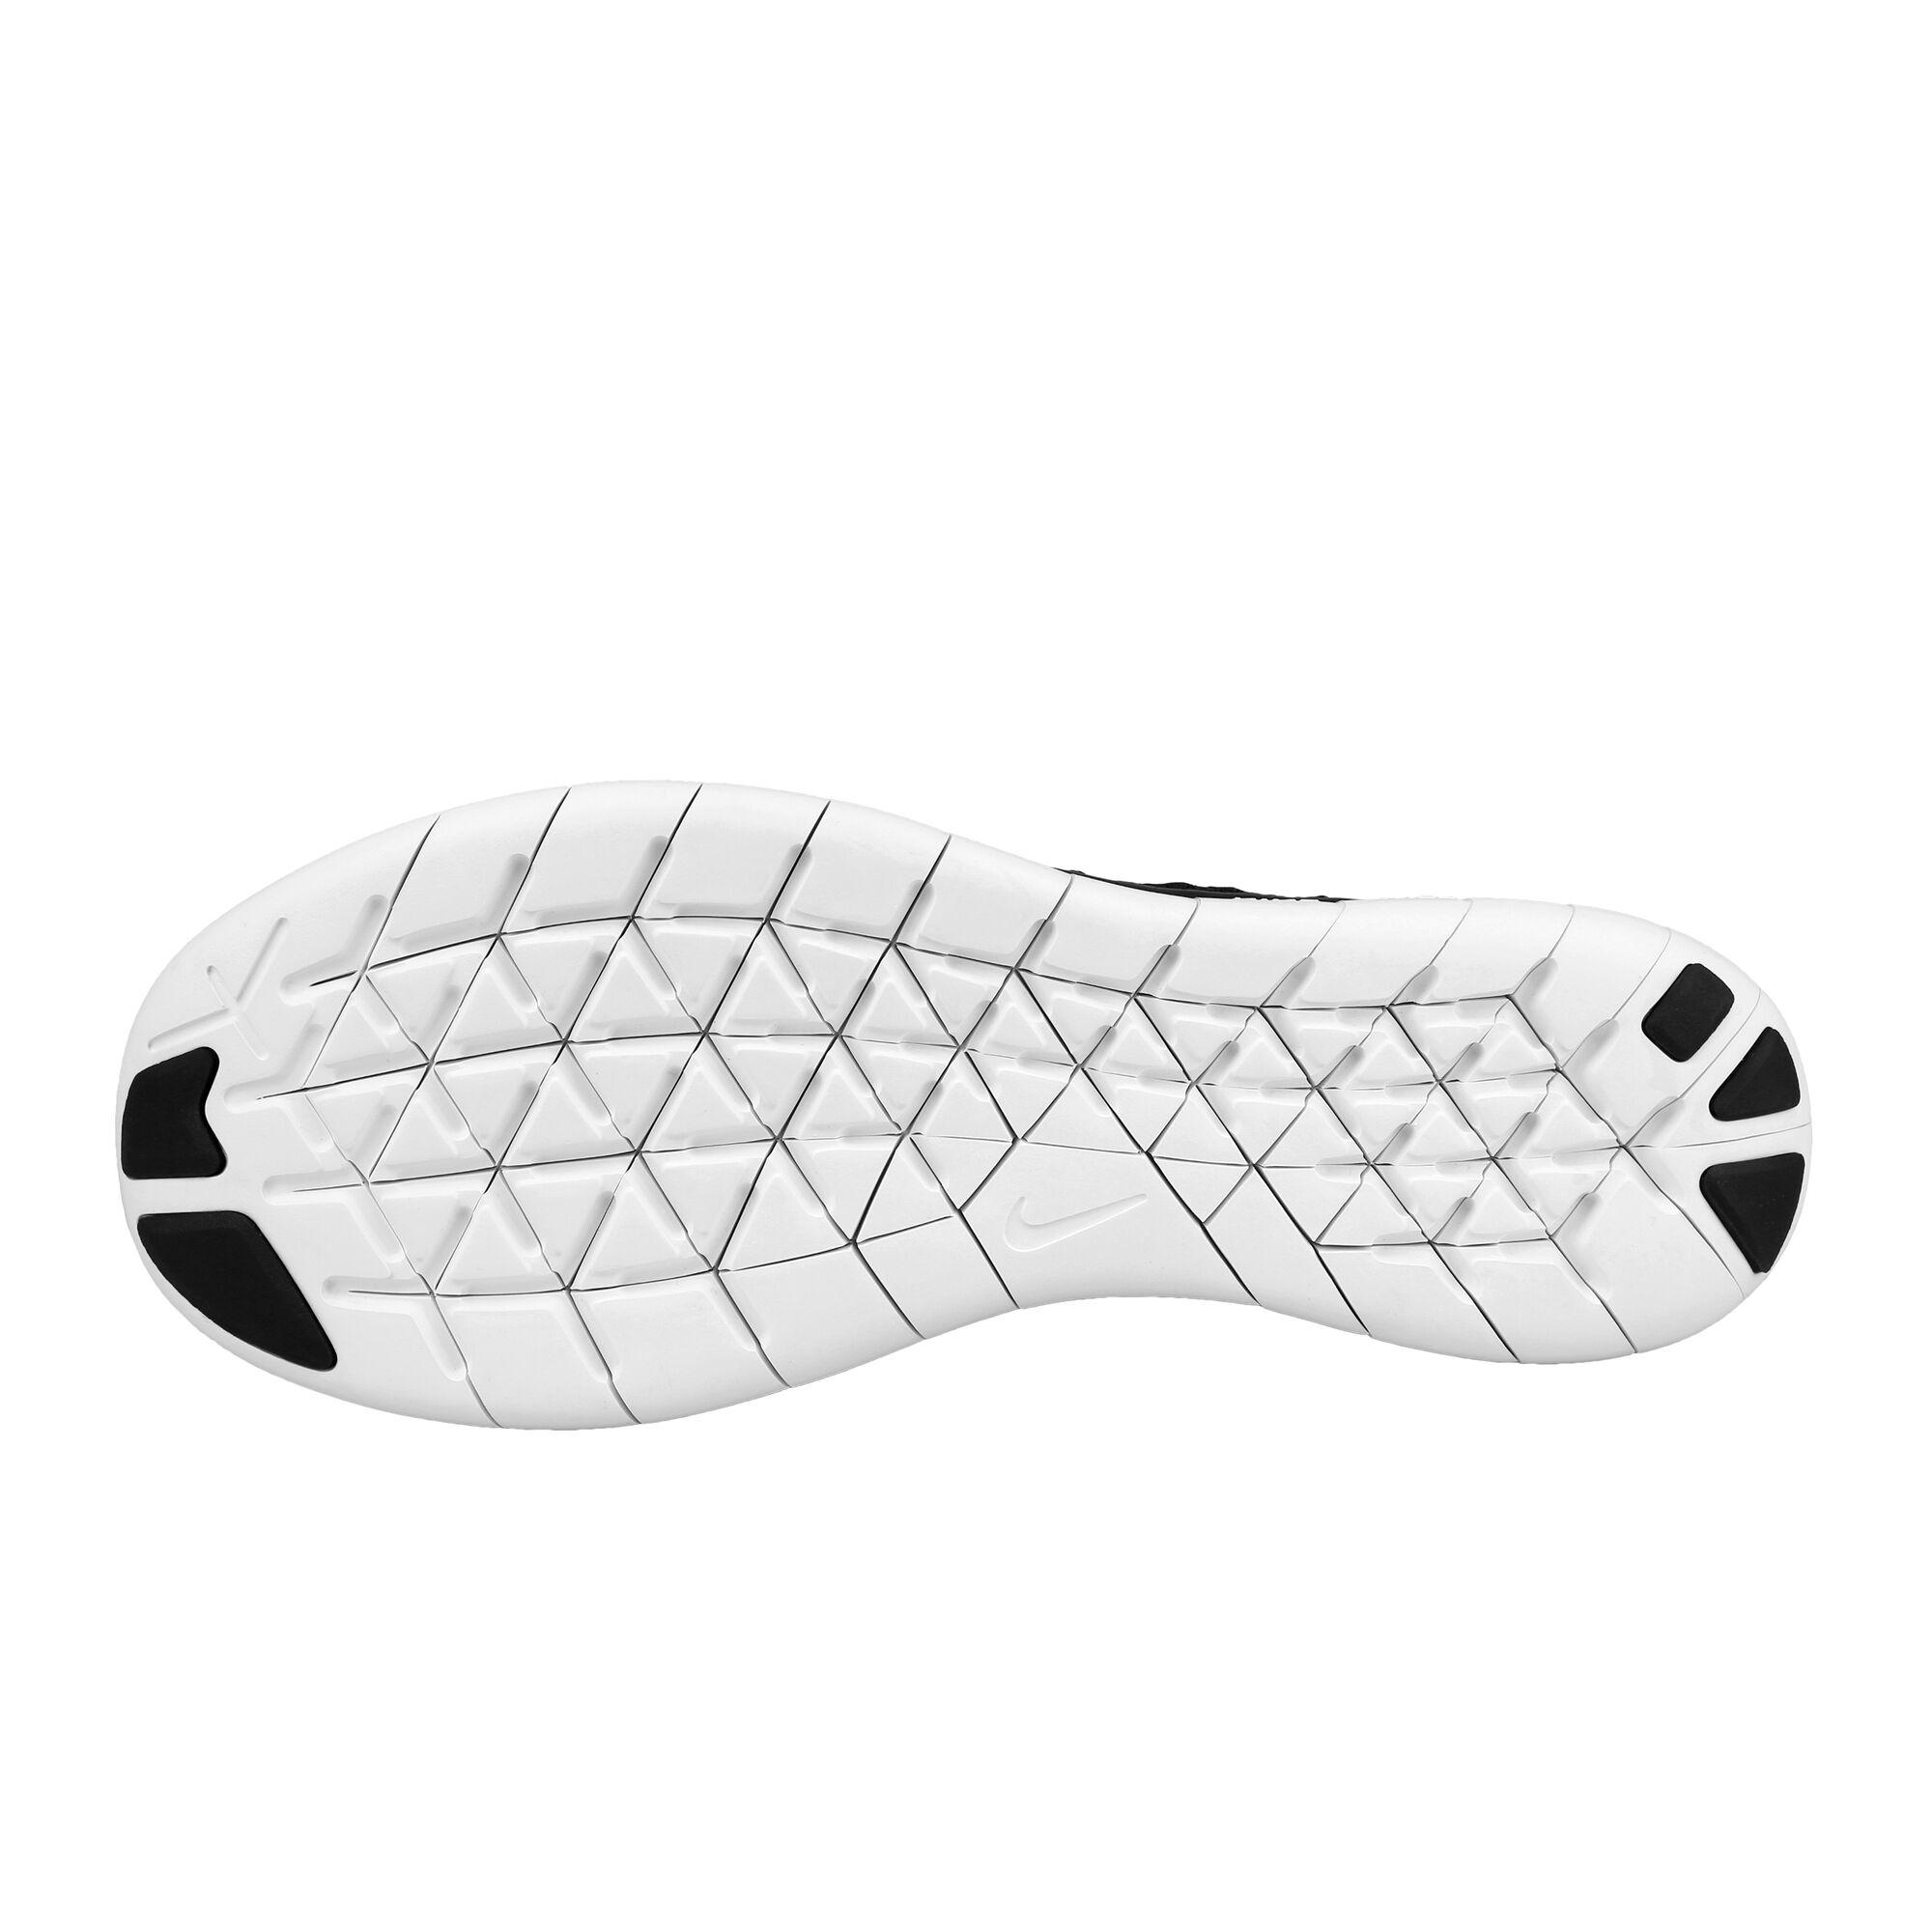 430951108ec18 buy Nike Free Run Flyknit 2017 Natural Running Shoe Men - Black ...